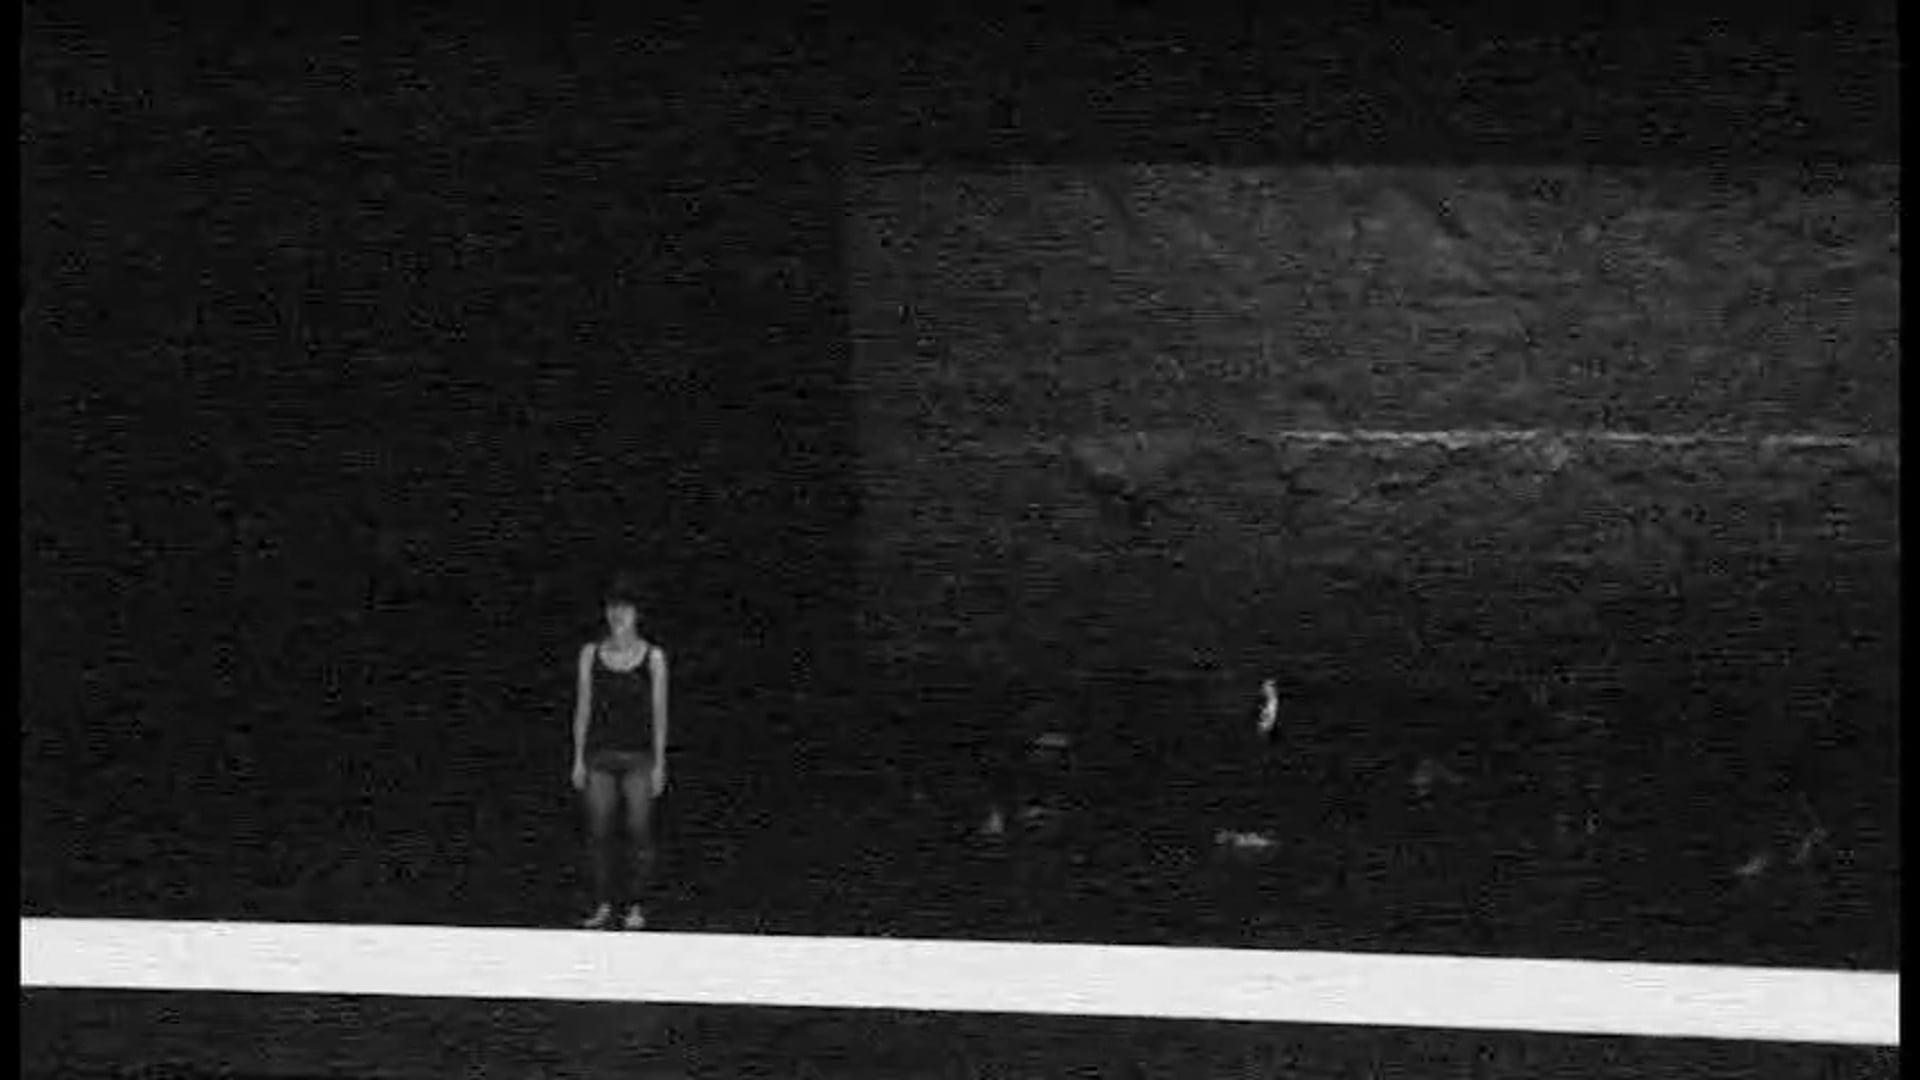 Dança Doente - Marcelo Evelin / Demolition Incorporada